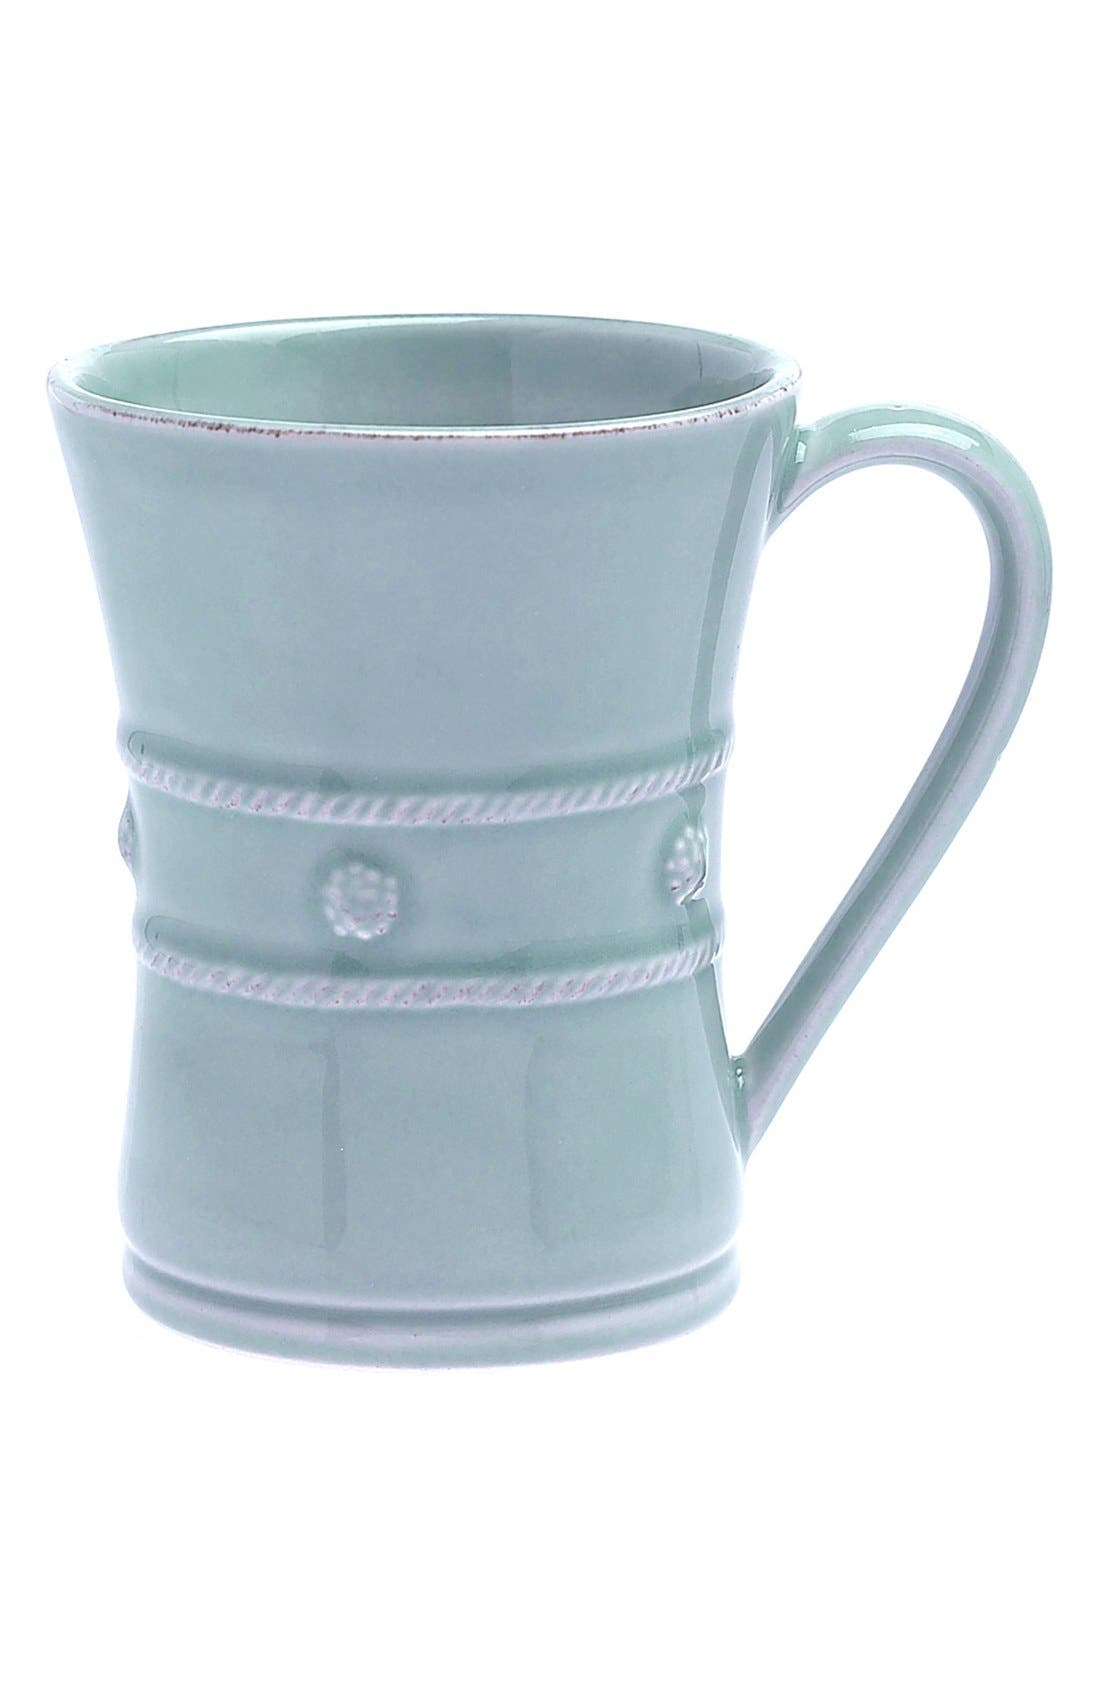 Juliska 'Berry and Thread' Ceramic Coffee Mug